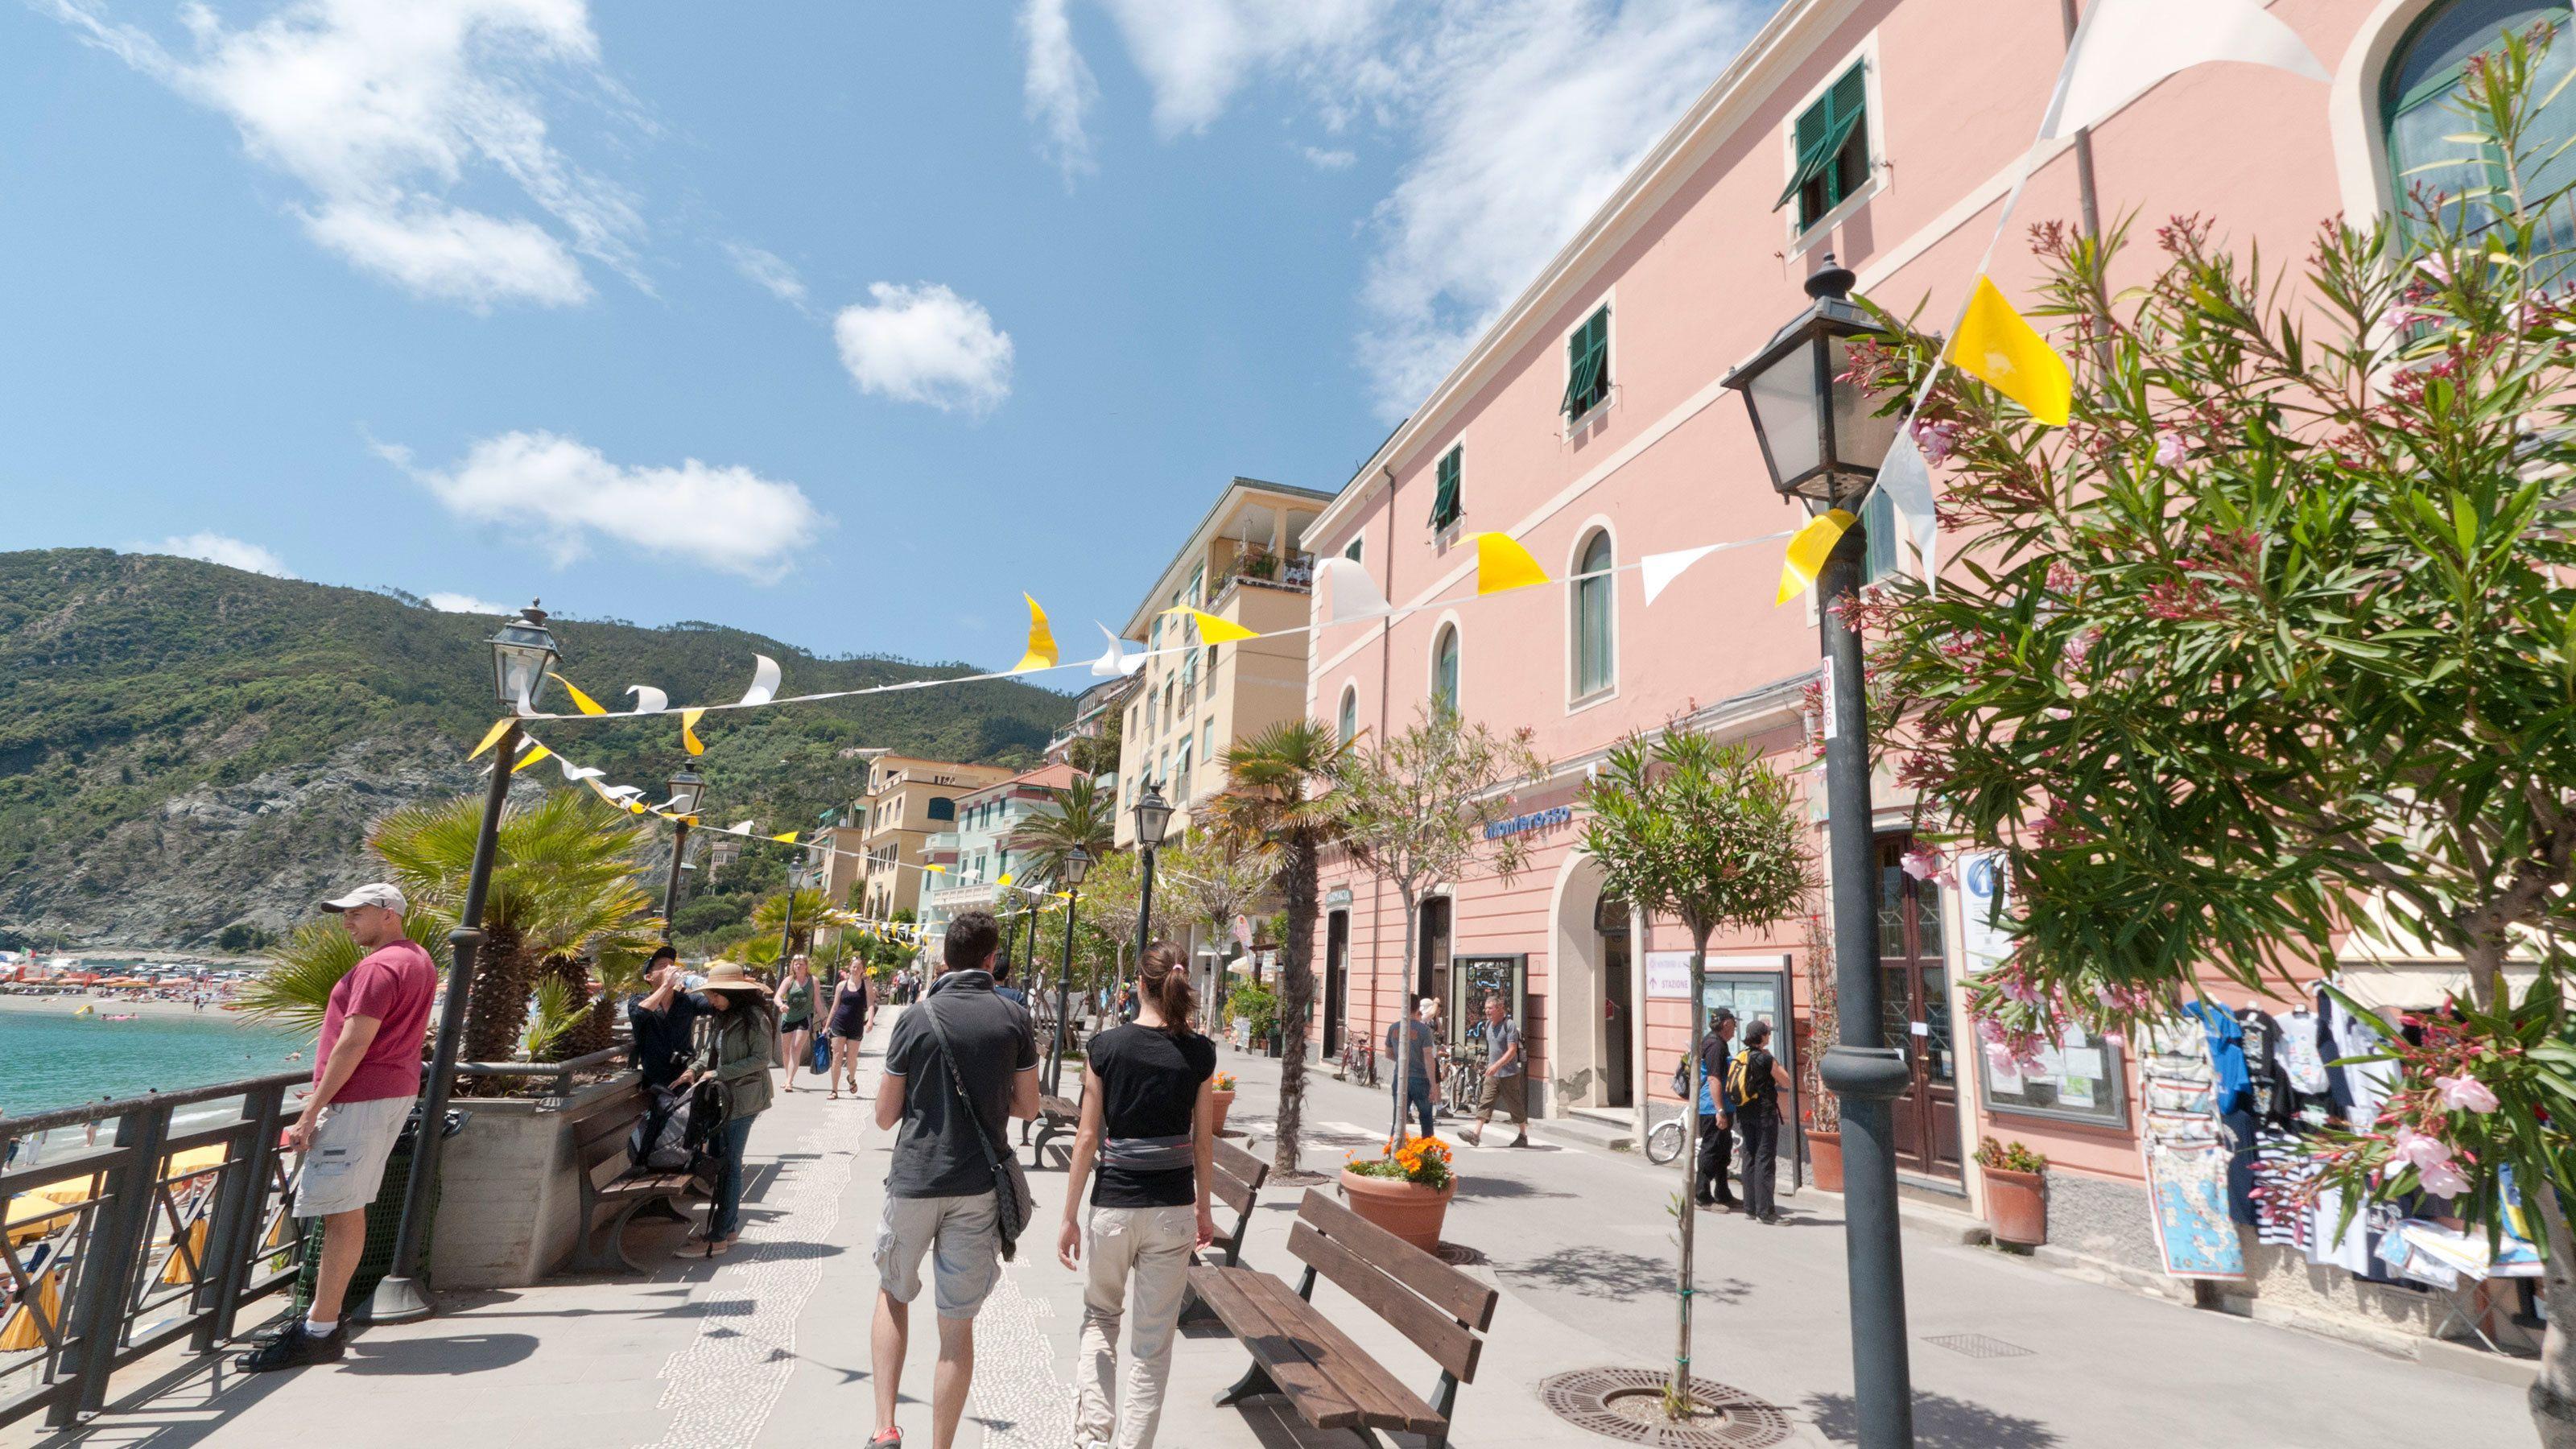 Italian waterfront and boardwalk